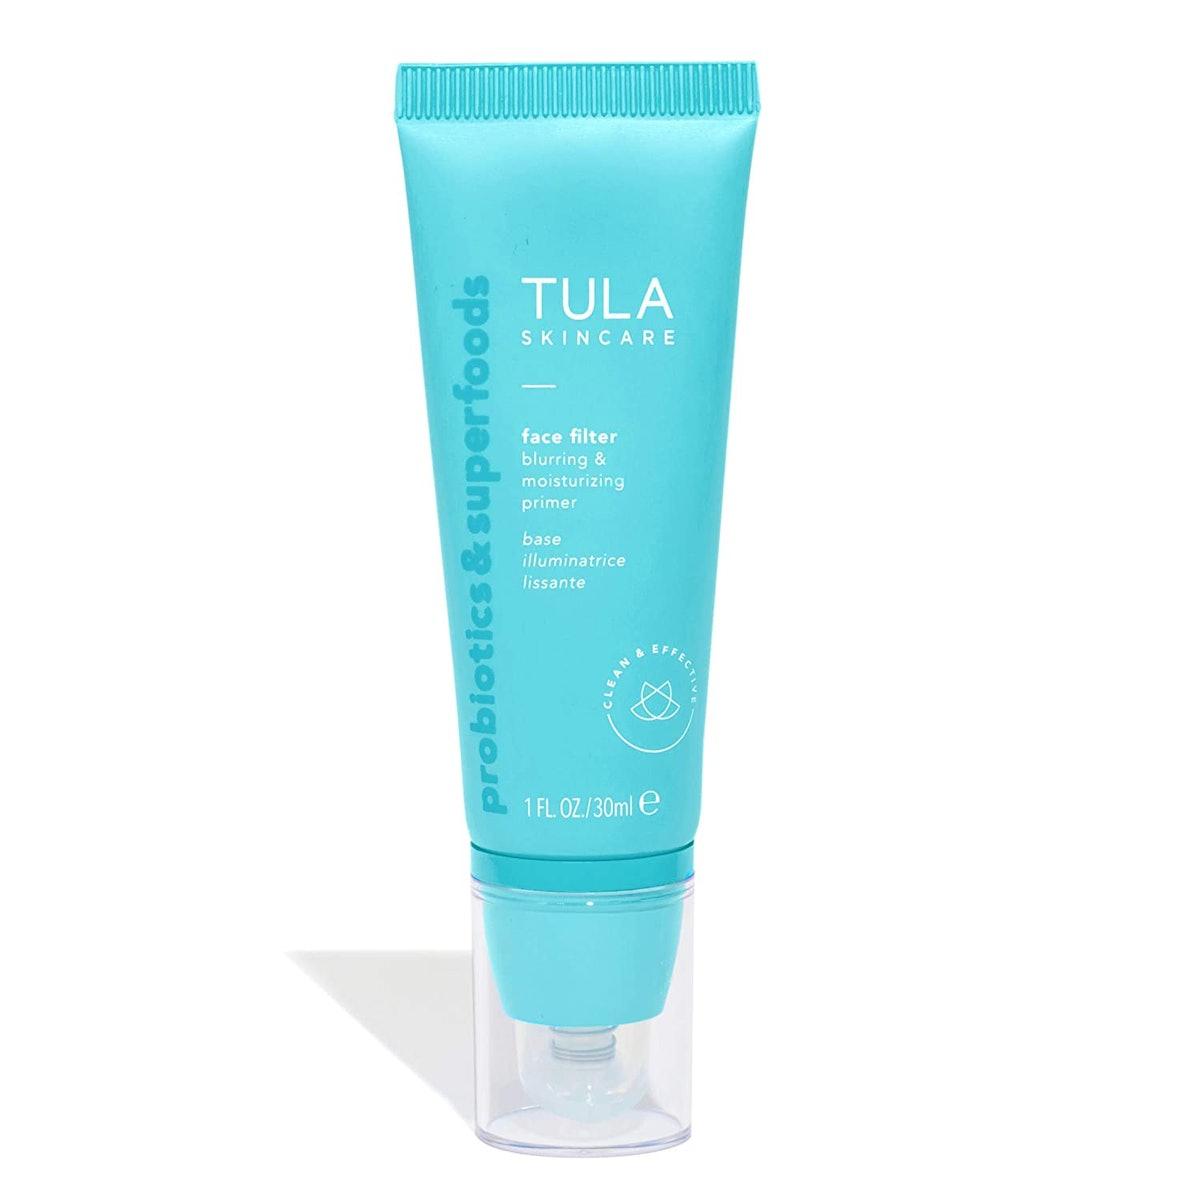 TULA Skincare Face Filter